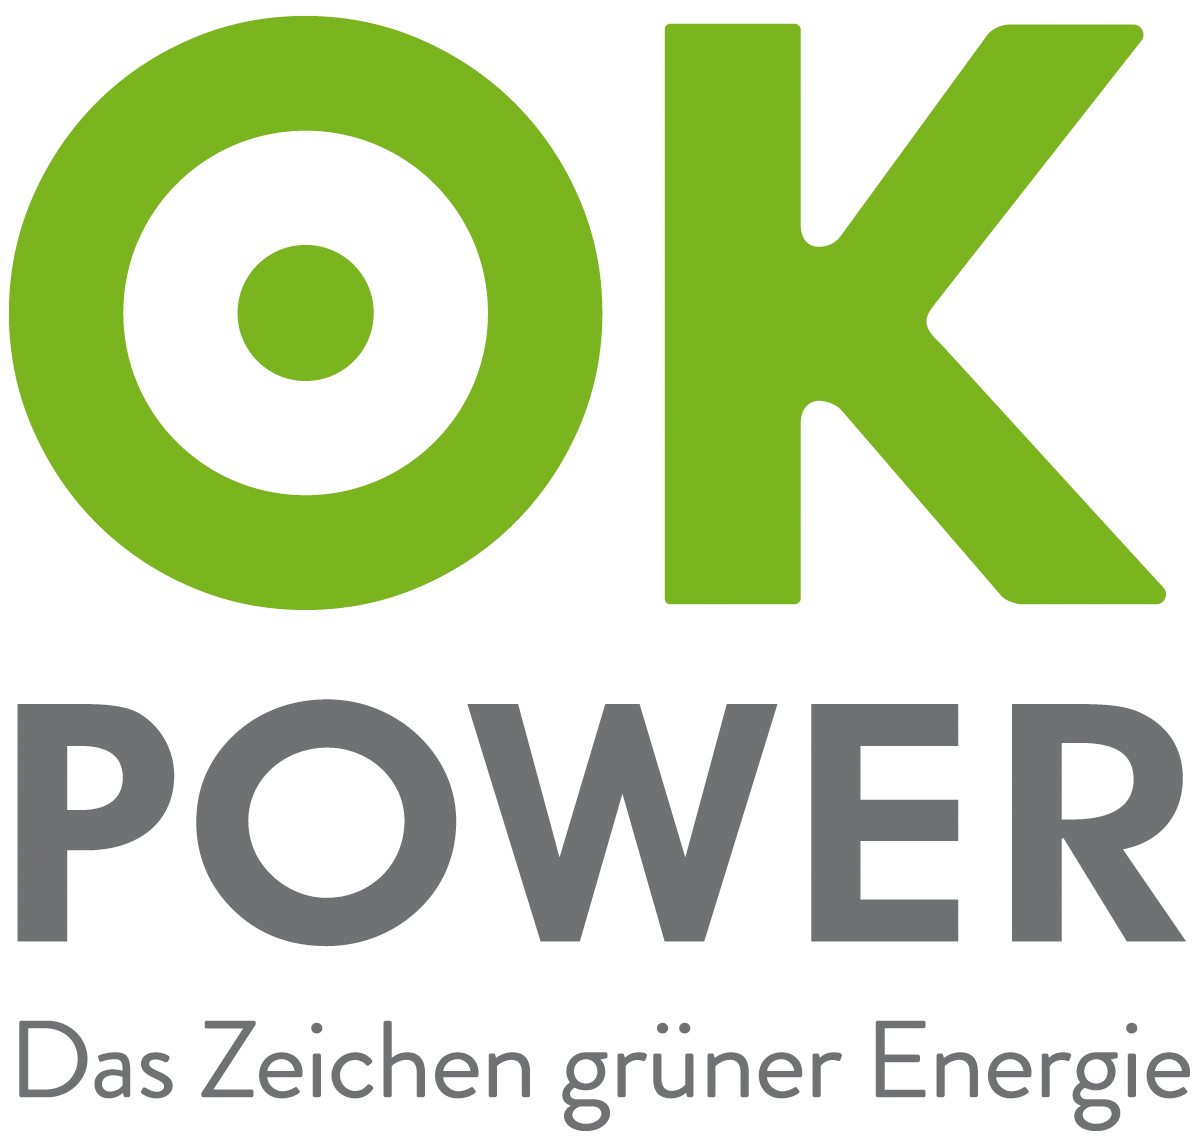 https://www.ok-power.de/infothek-lexikon/downloads/material.html?file=files/ok_power_theme/images/downloads_pressematerial/logos/jpg/ok-power-logo%2Bclaim_rgb.jpg